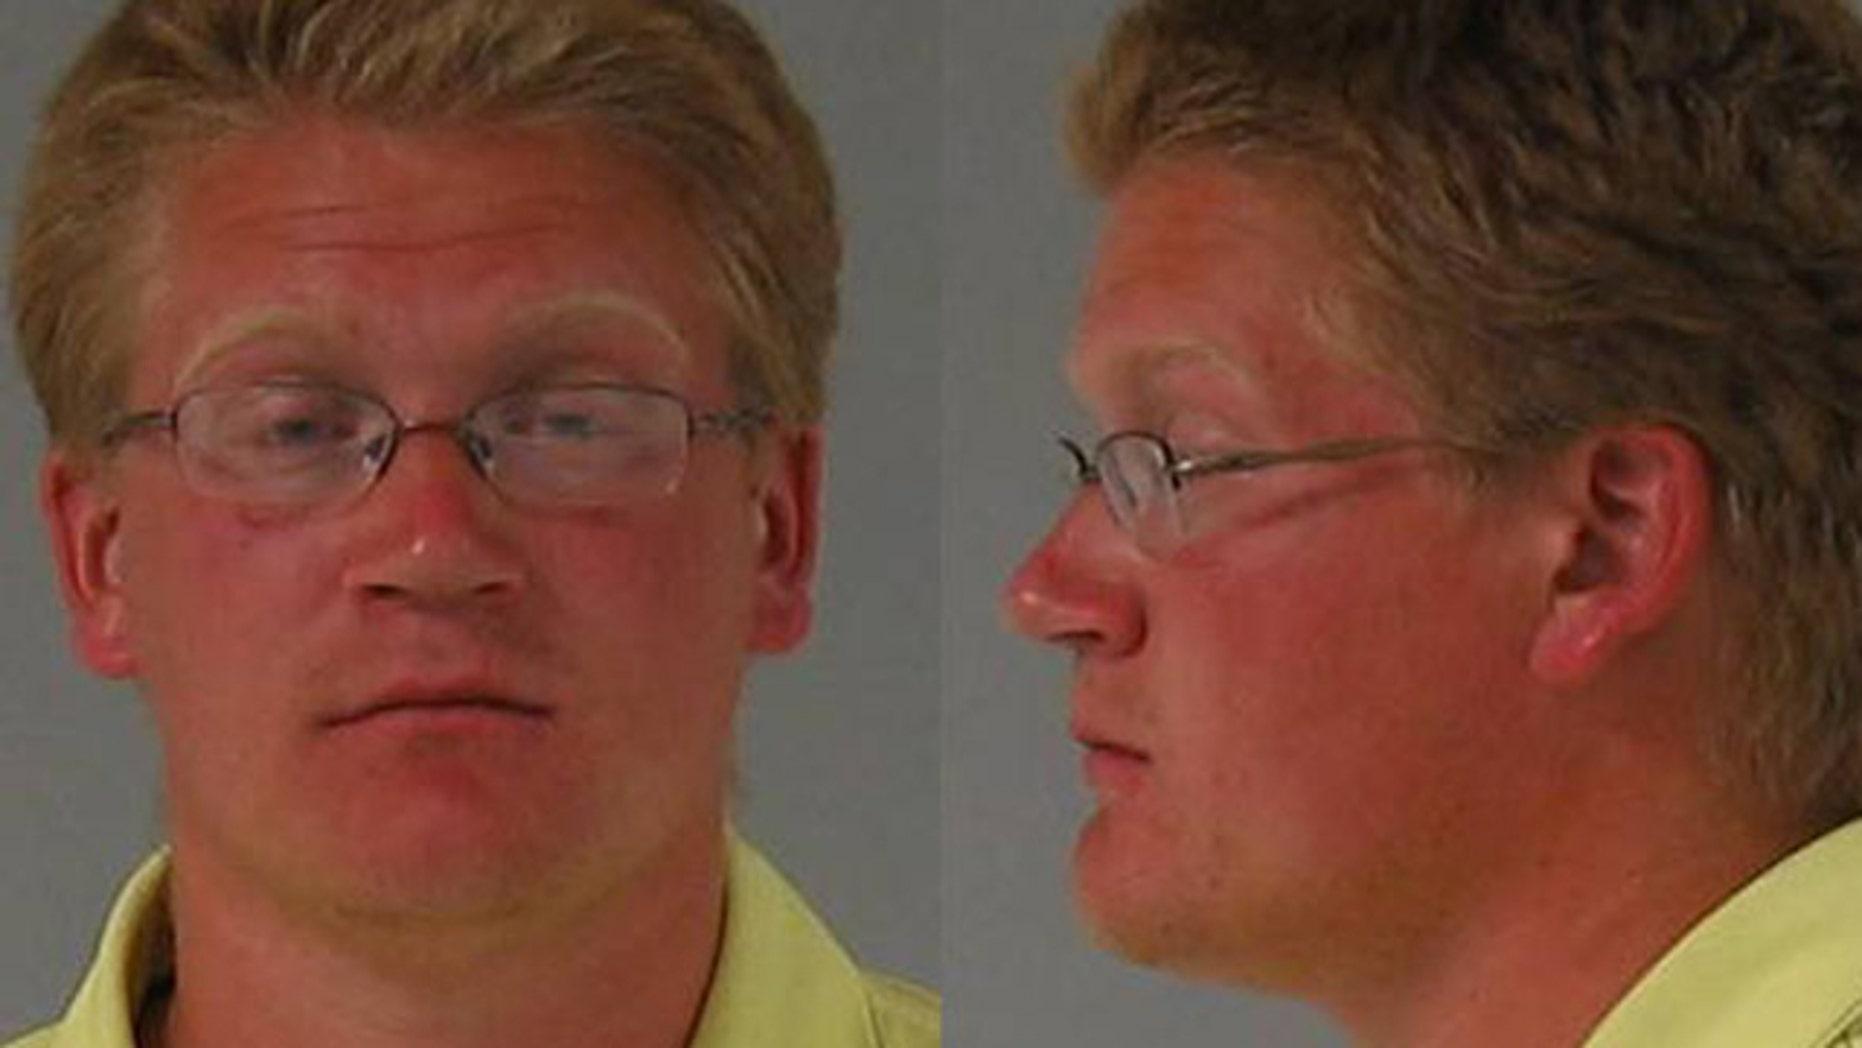 This undated photo shows 34-year-old Kyle Gordon Ernest.